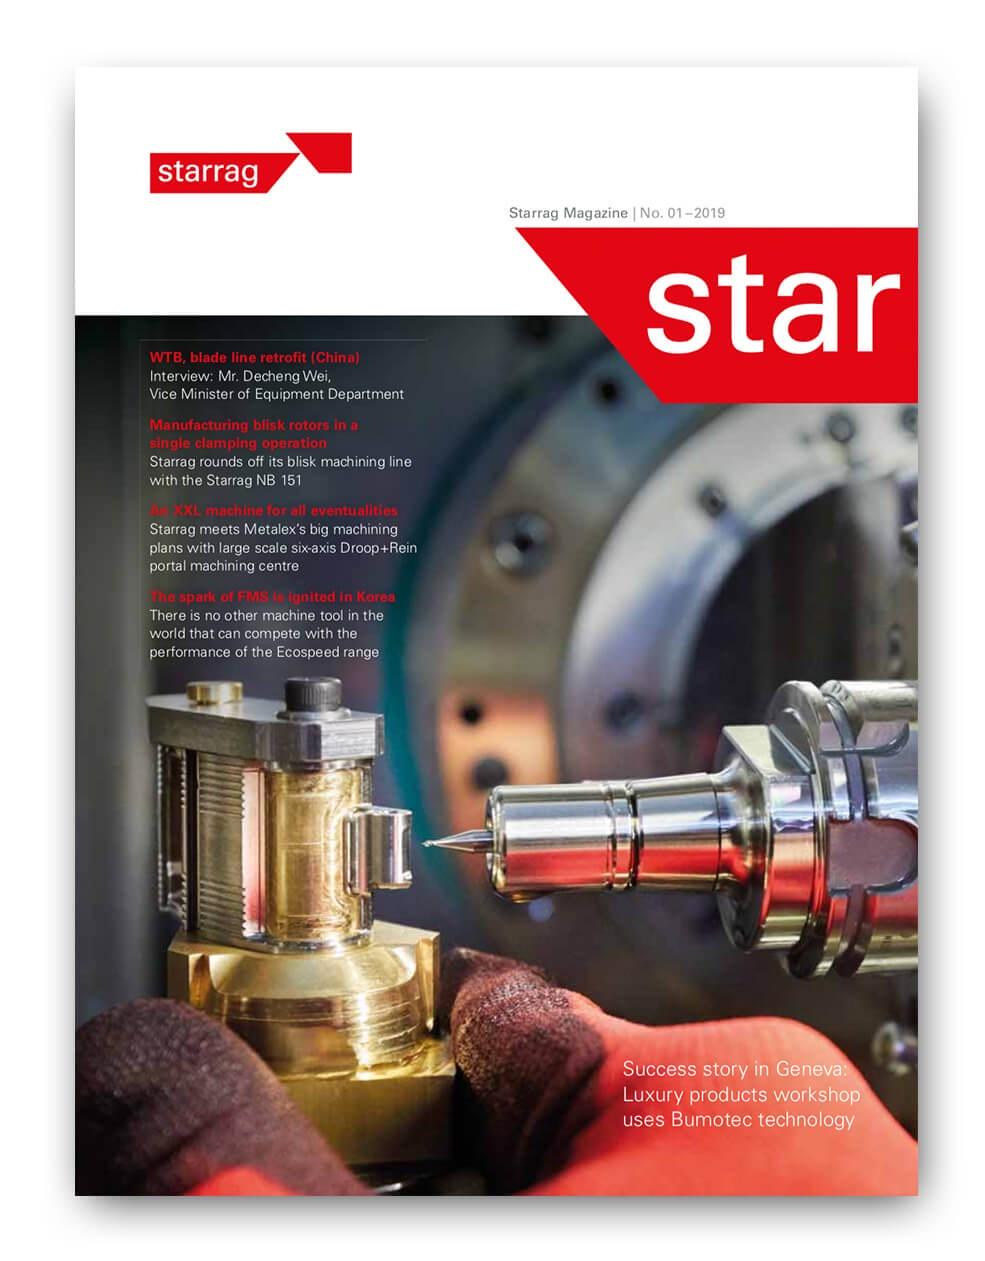 Overview - starrag